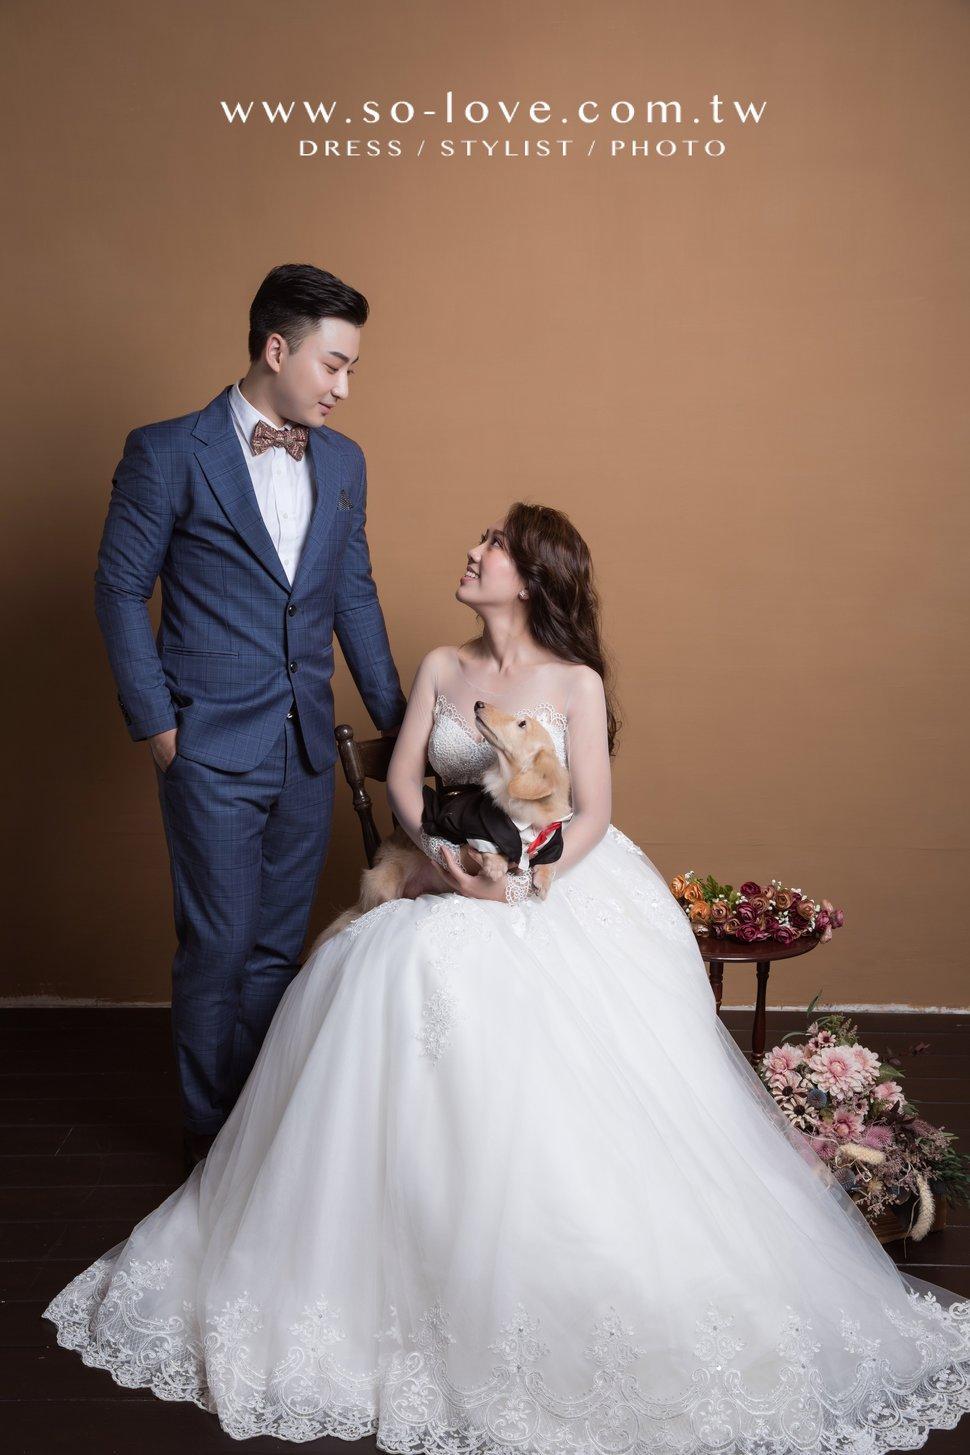 Y RYAN3990 - So.Love Wedding 樂樂蕾絲《結婚吧》